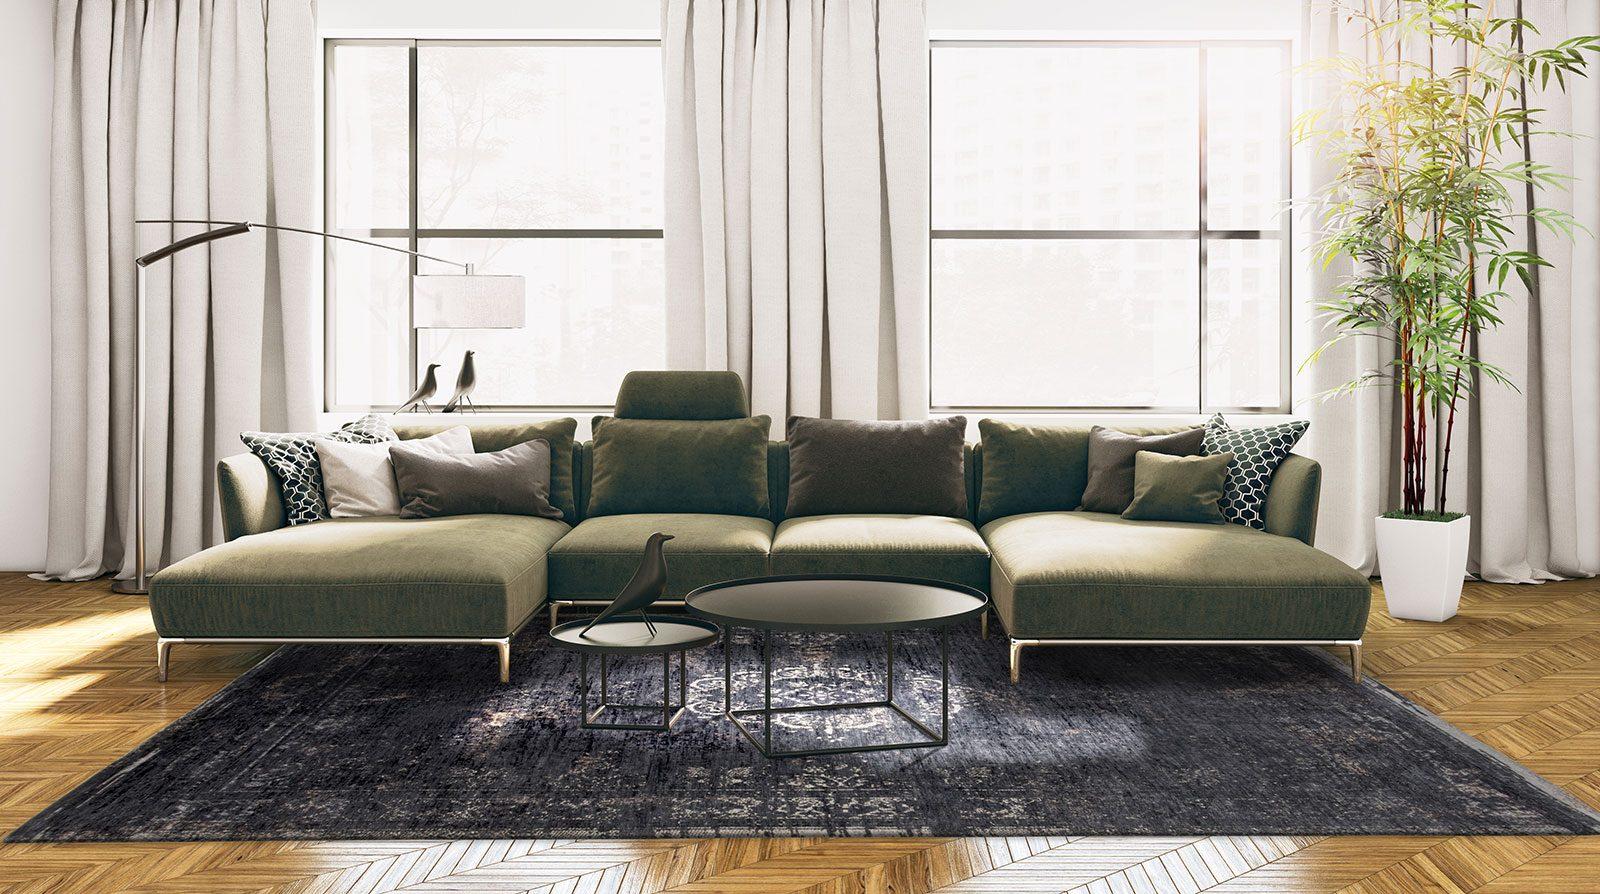 alfombras Louis De Poortere LX8263 Fading World Medaillon Mineral Black interior